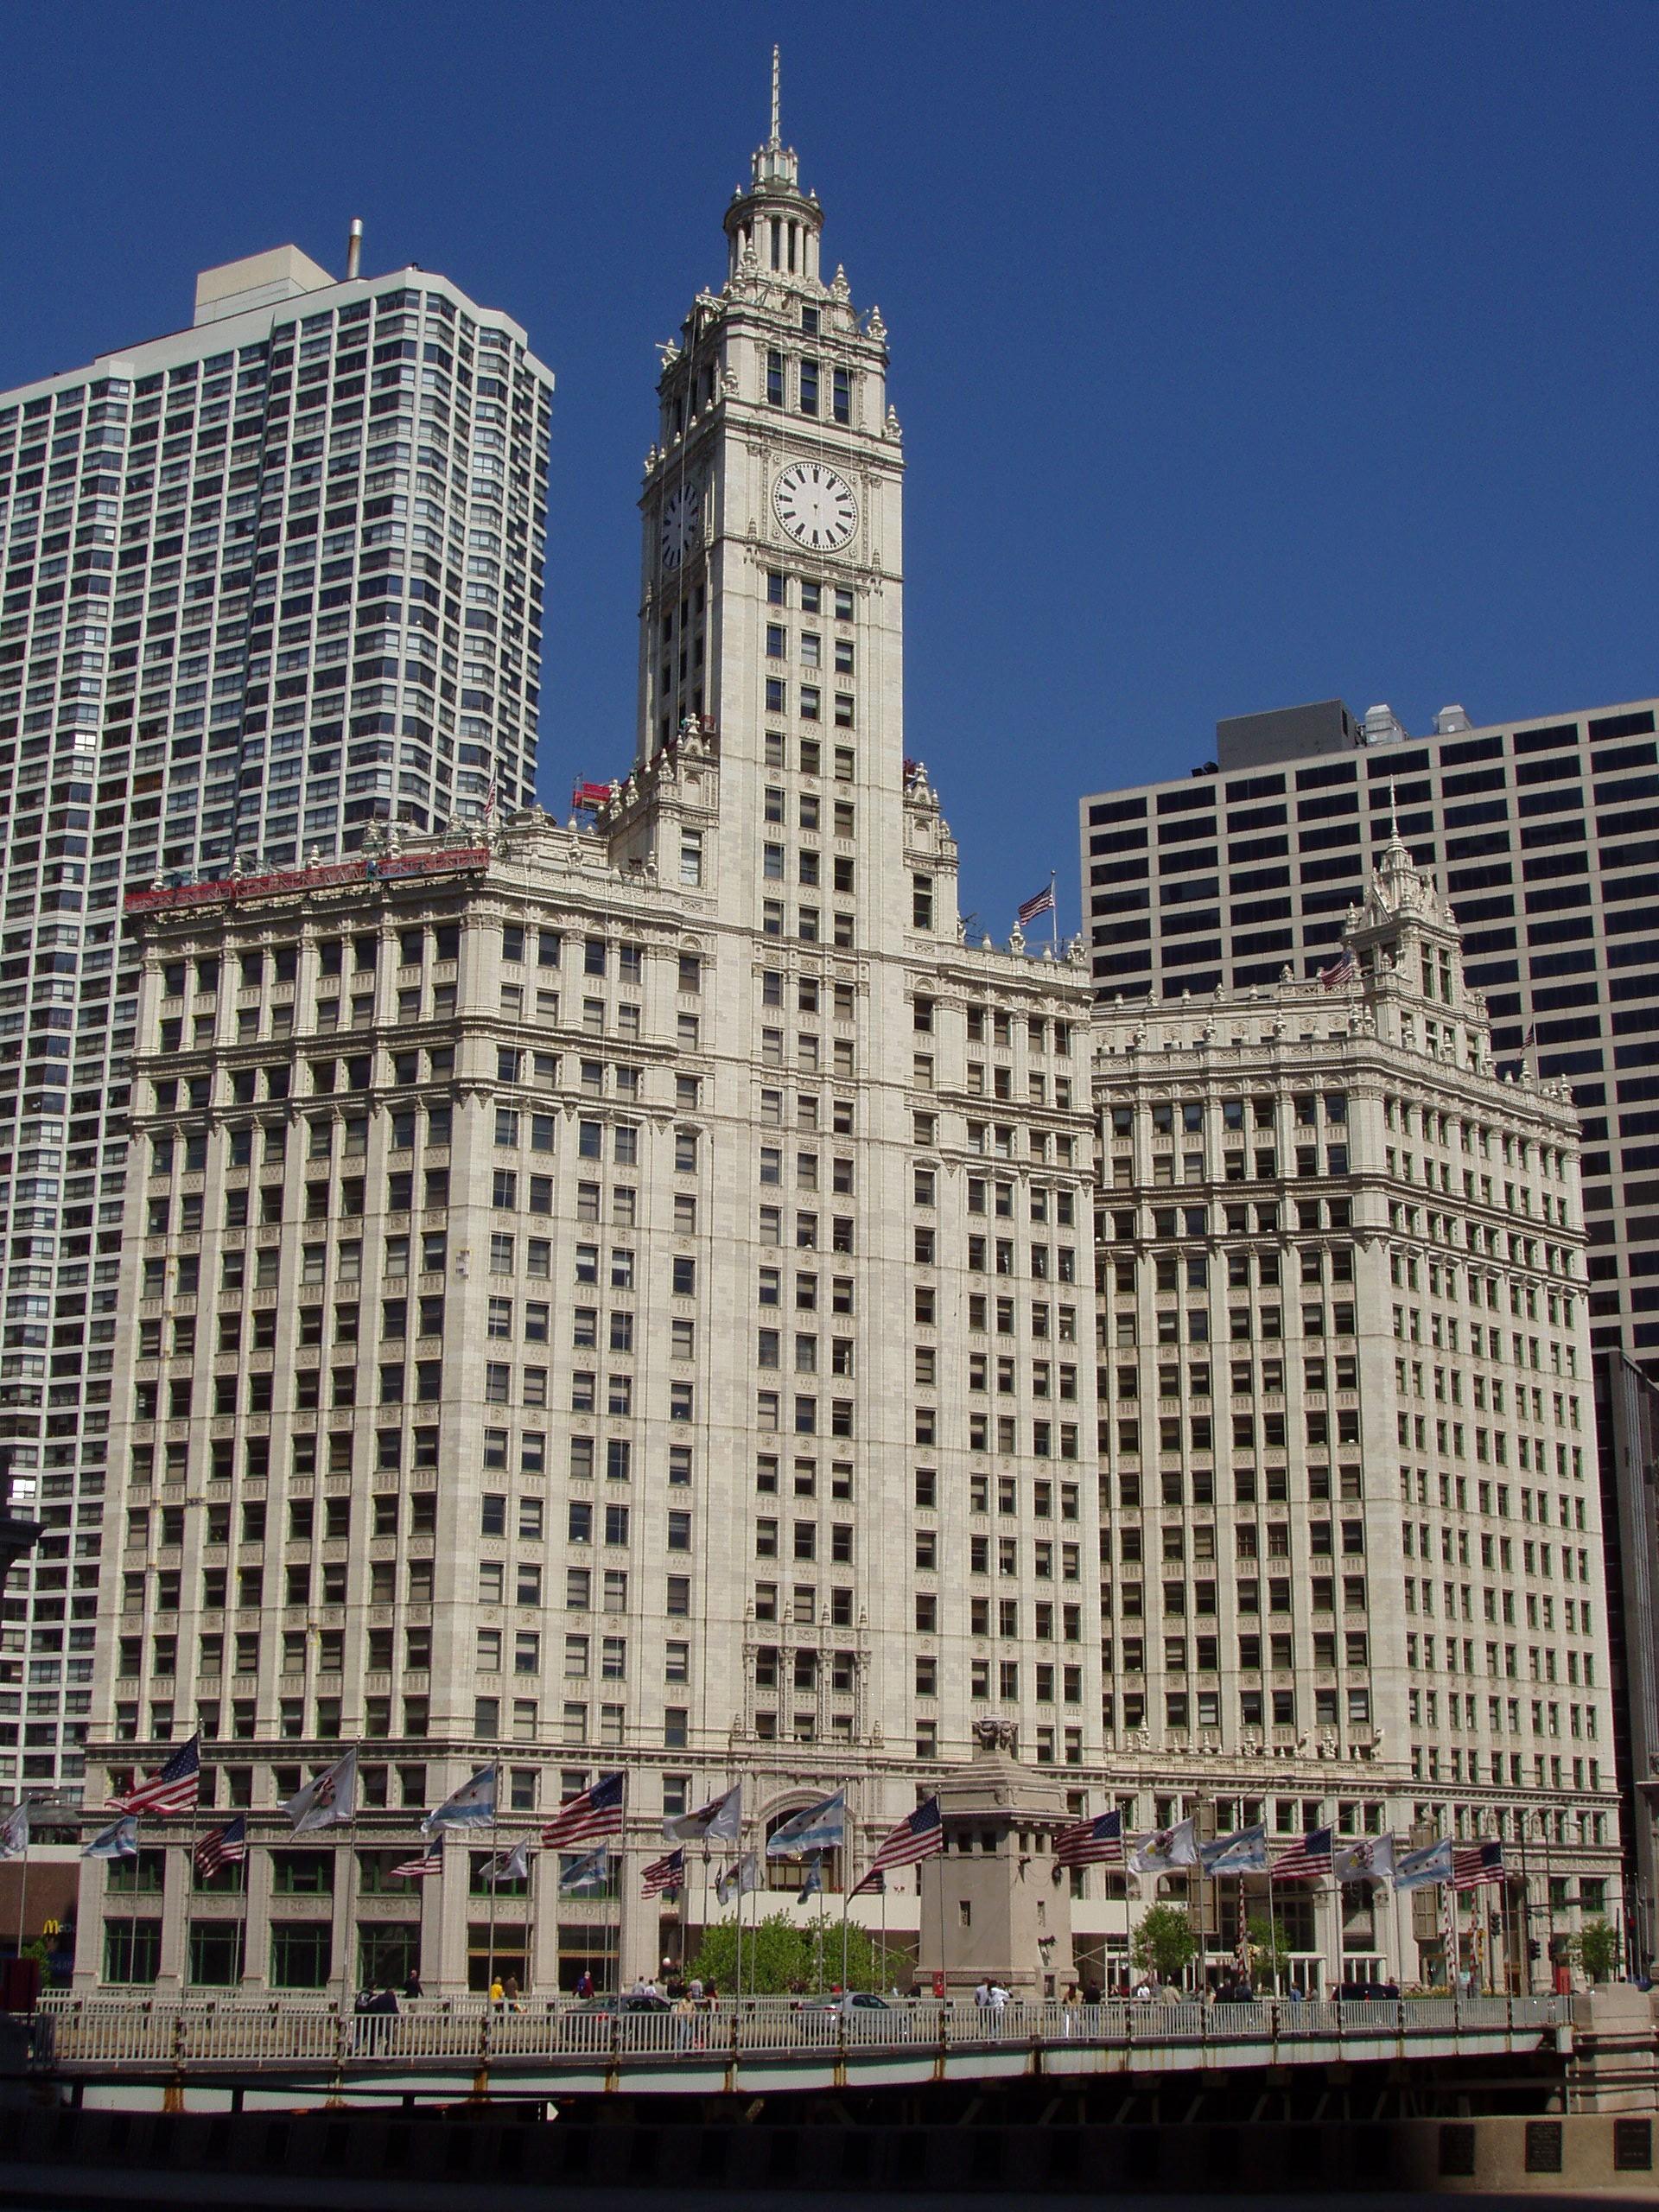 Wrigley_Building_-_Chicago,_Illinois.JPG